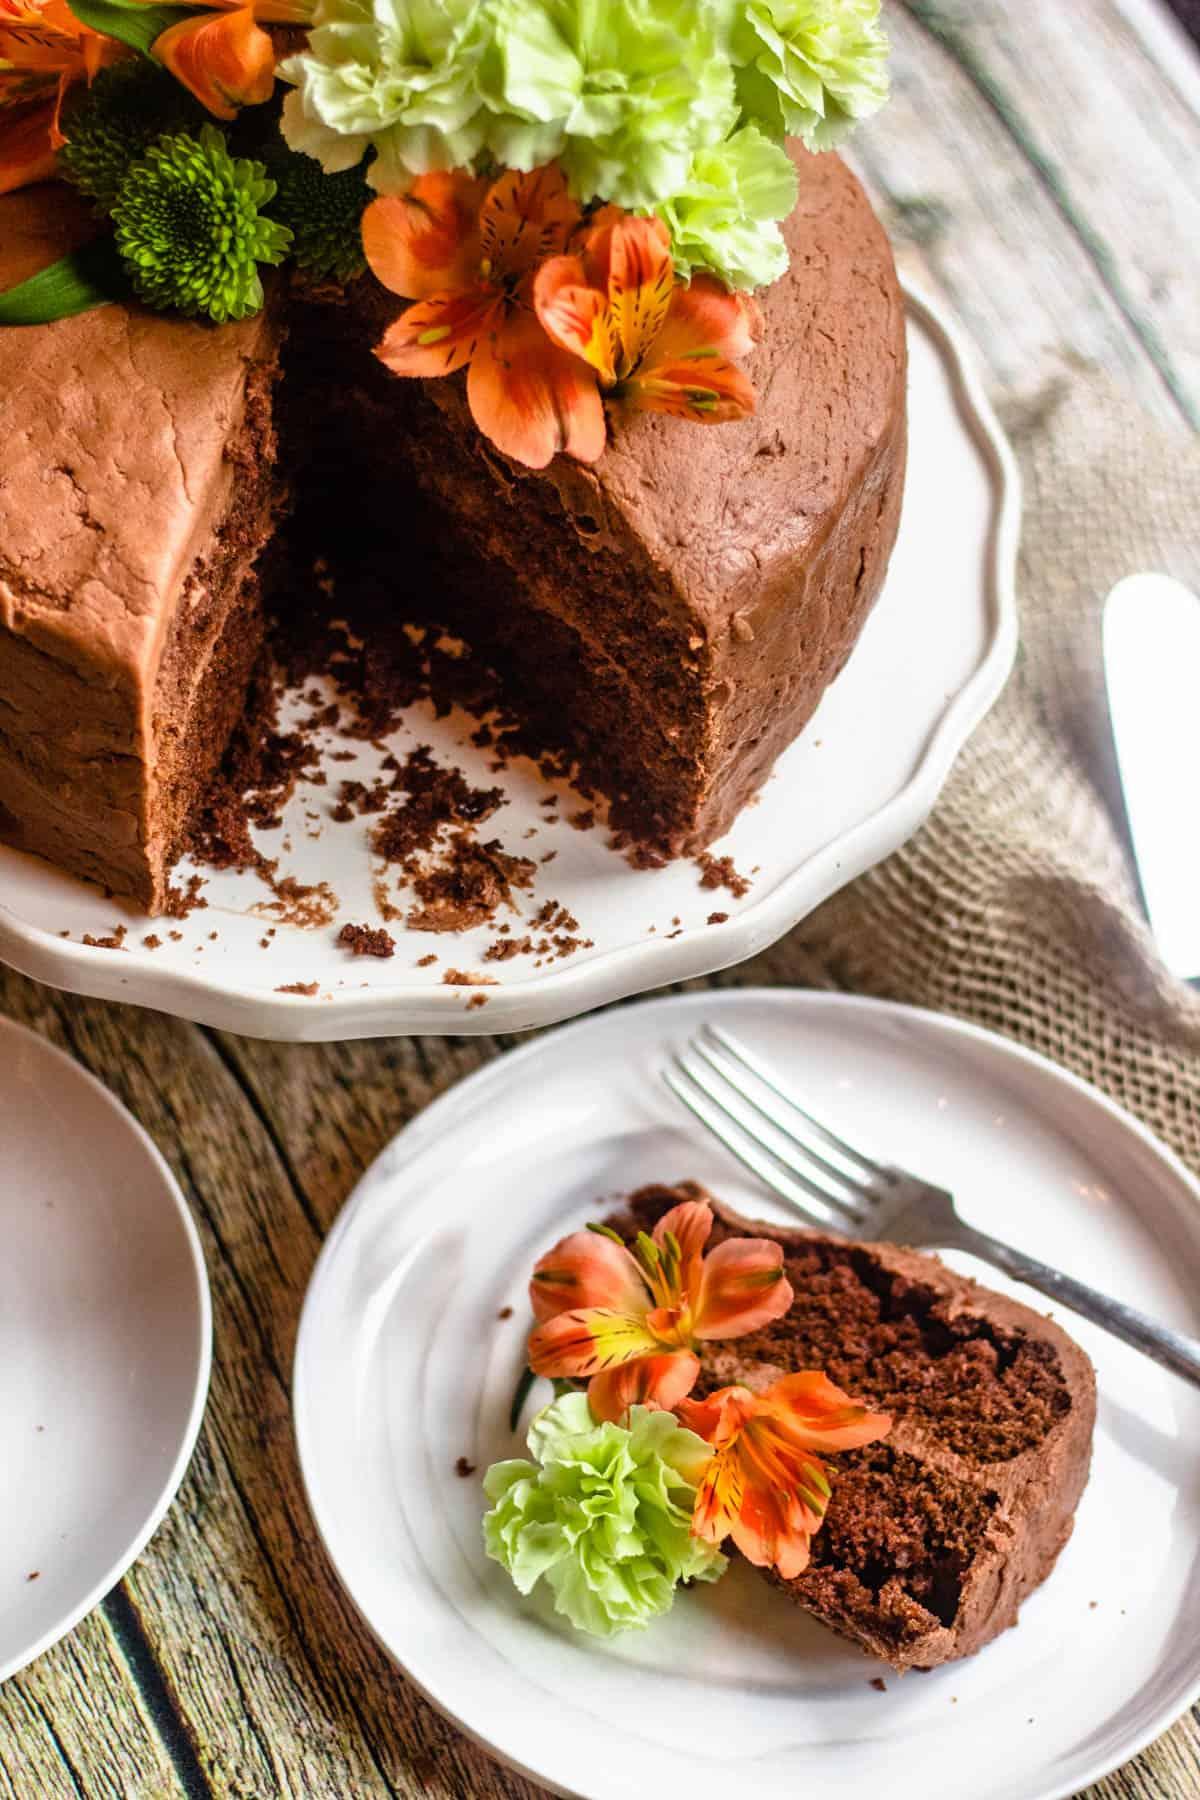 Piece of cake next to cake pans